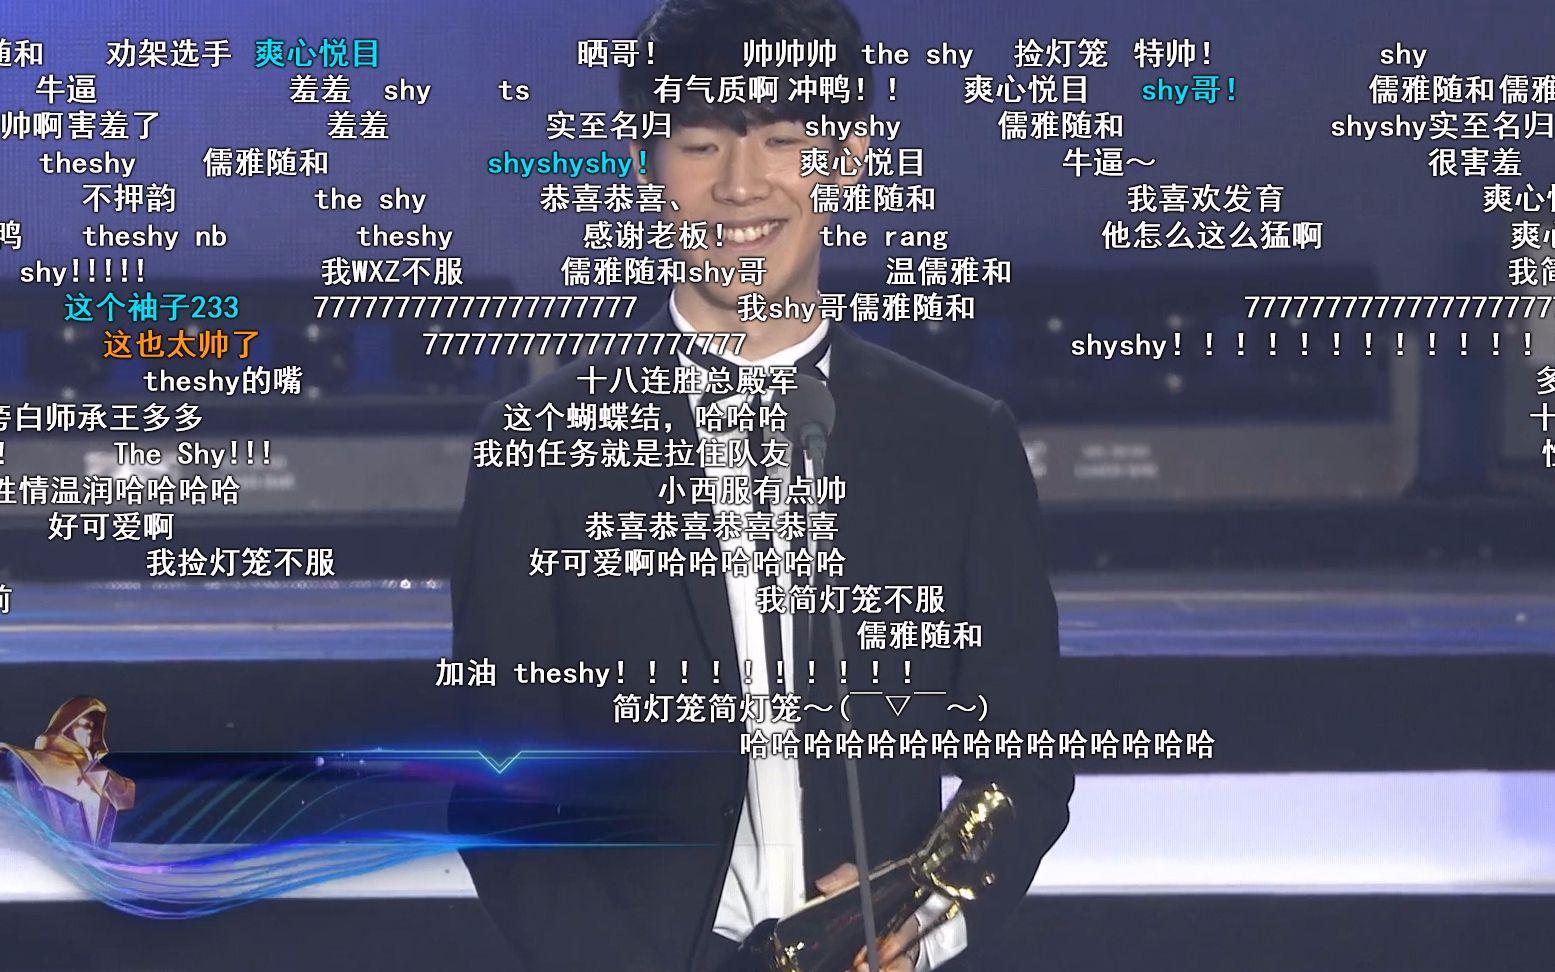 LOL頒獎之夜The Shy用中文上臺致辭 彈幕直接炸了!原來是儒雅隨和的莽啊!_嗶哩嗶哩 (゜-゜)つロ 干杯~-bilibili